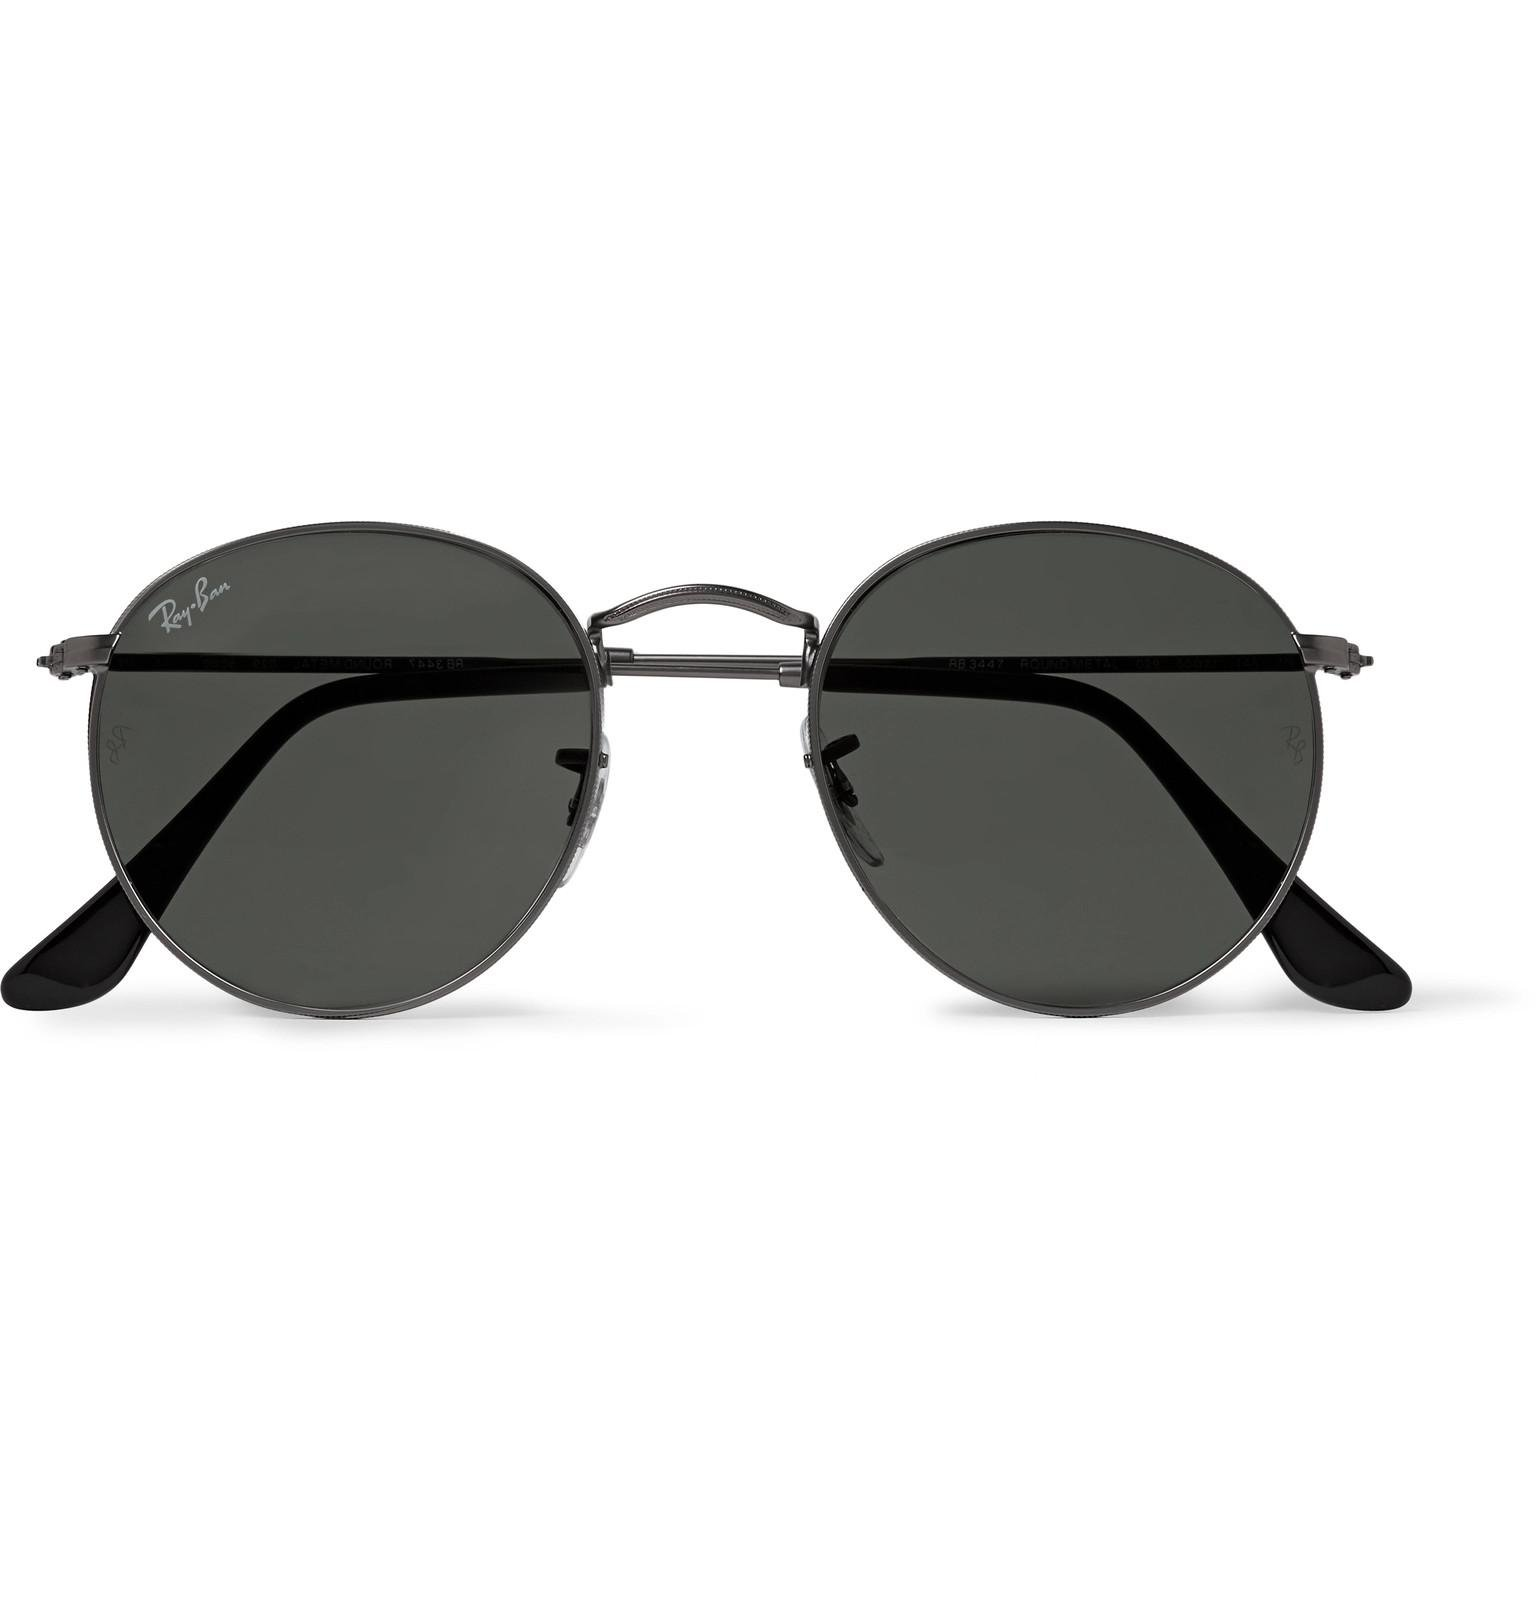 7bc985d15f Ray-Ban. Men s Round-frame Gunmetal-tone Sunglasses. £125 From MR PORTER